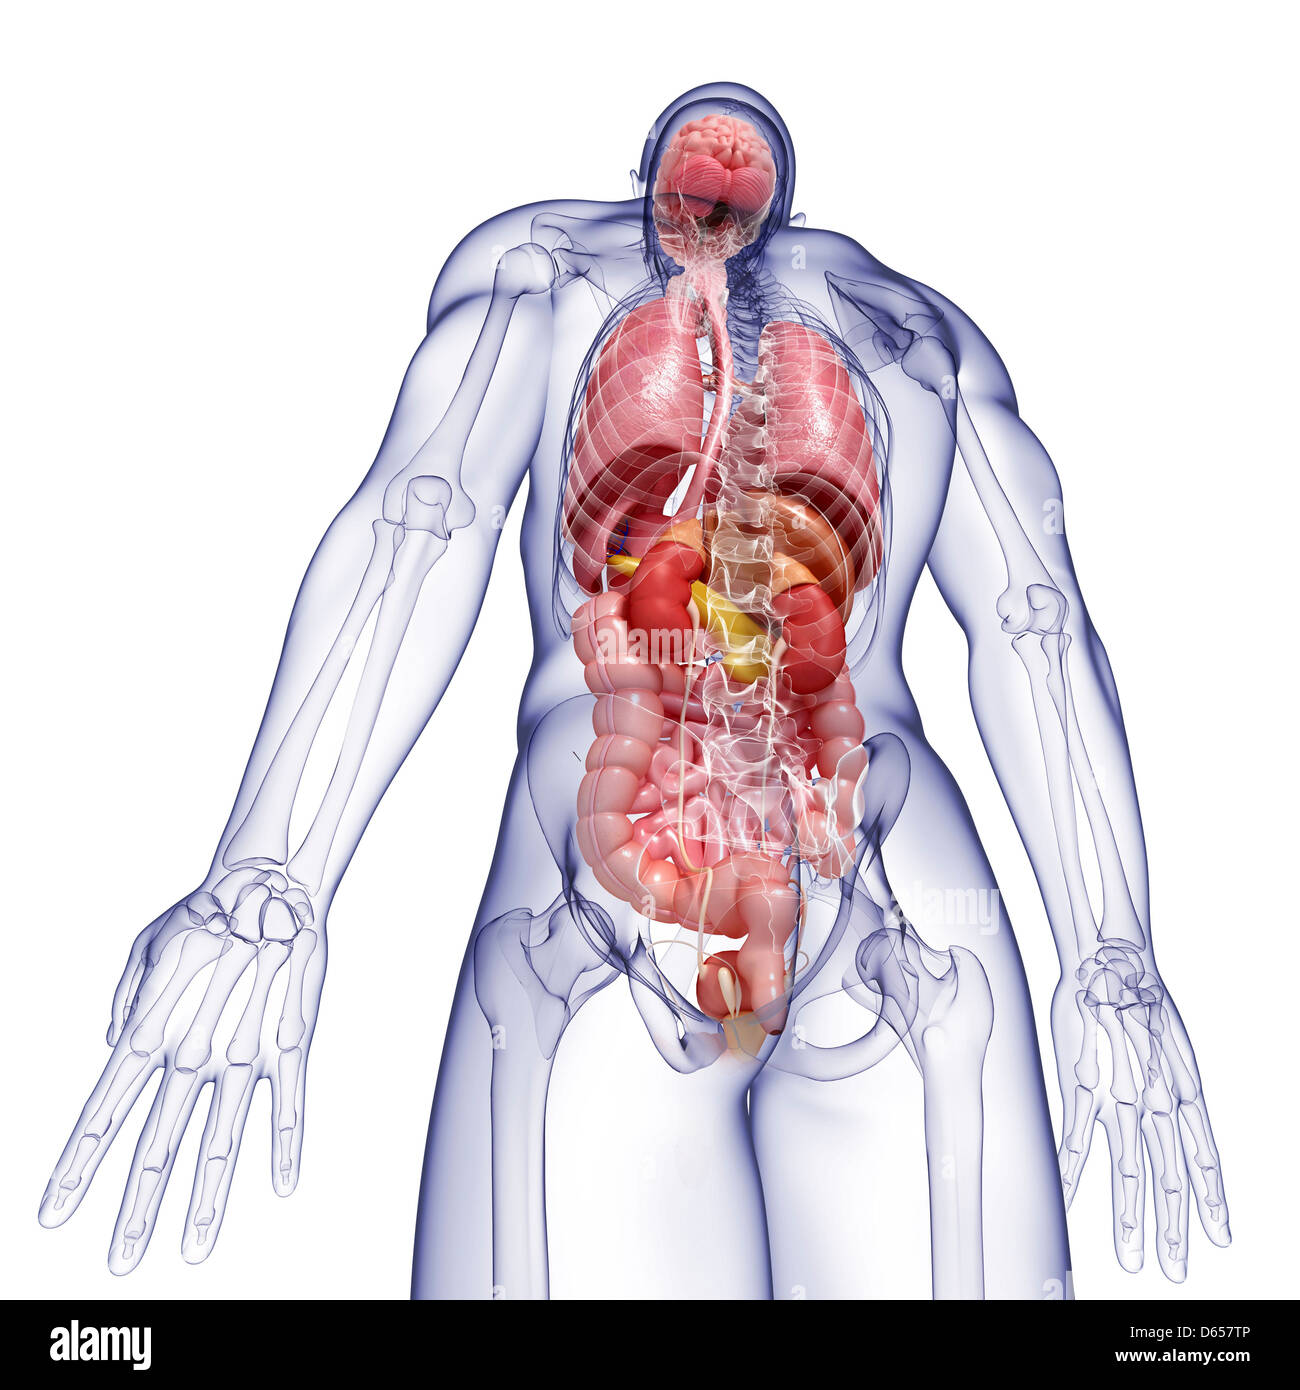 Pancreas And Kidney Imágenes De Stock & Pancreas And Kidney Fotos De ...